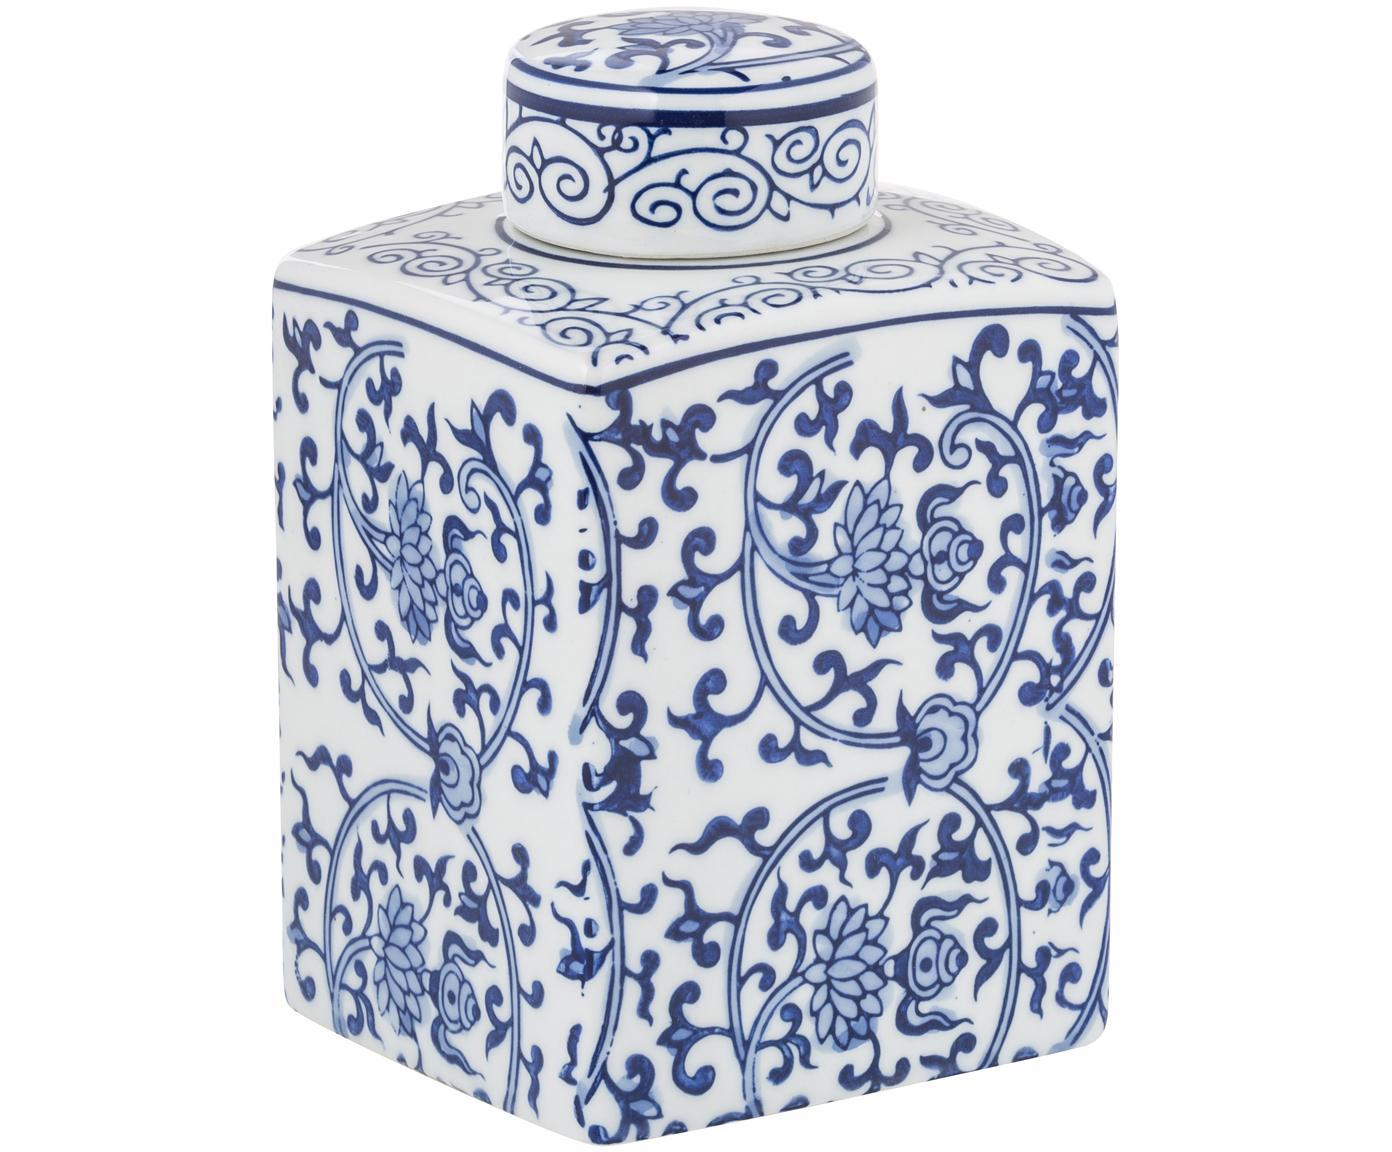 Vaso con coperchio in porcellana Ella, Porcellana, Blu, bianco, Larg. 11 x Alt. 17 cm